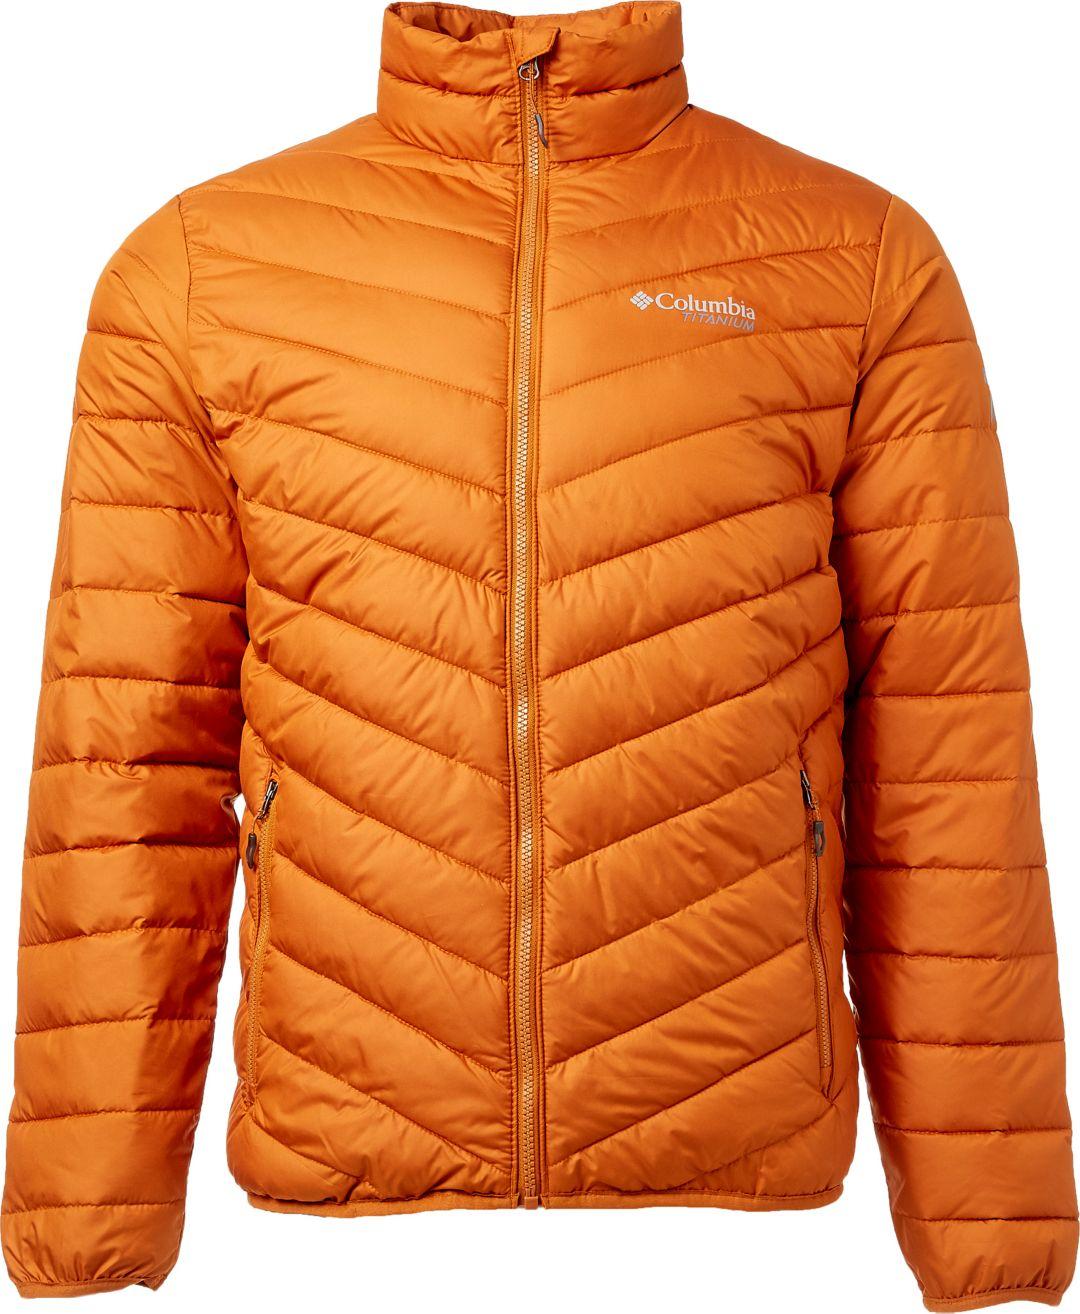 d018292eb72f Columbia Men's Titanium Valley Ridge Jacket | DICK'S Sporting Goods